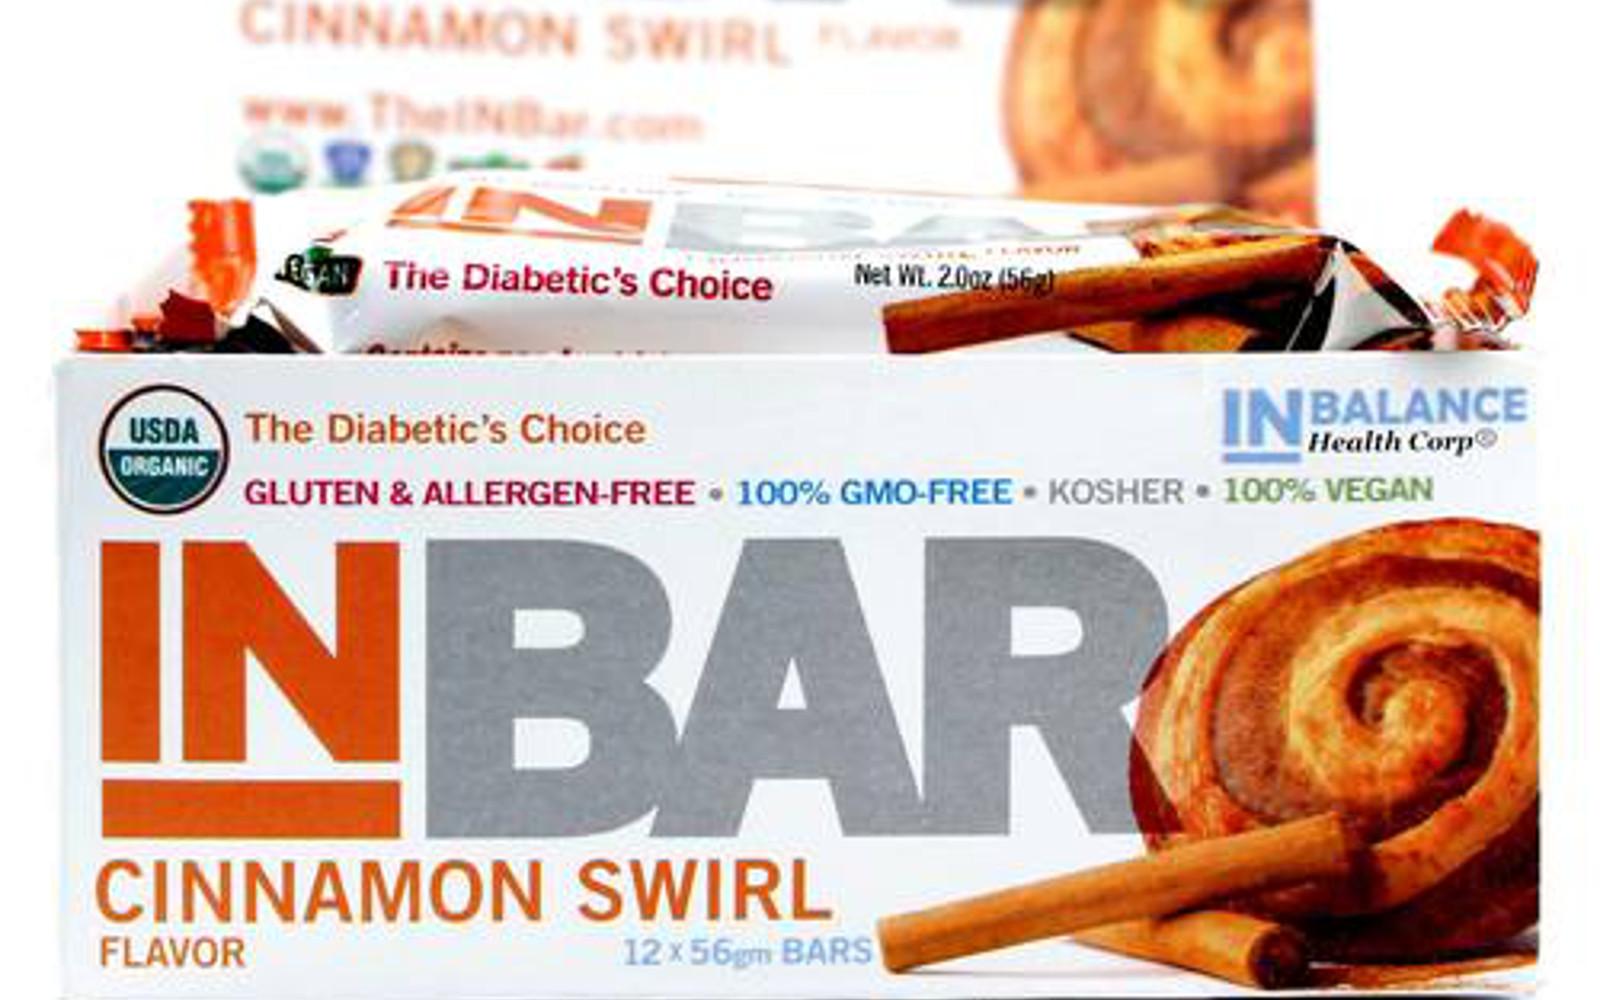 Ingredients in meta health bars - Inbar Cinnamon Swirl Bars